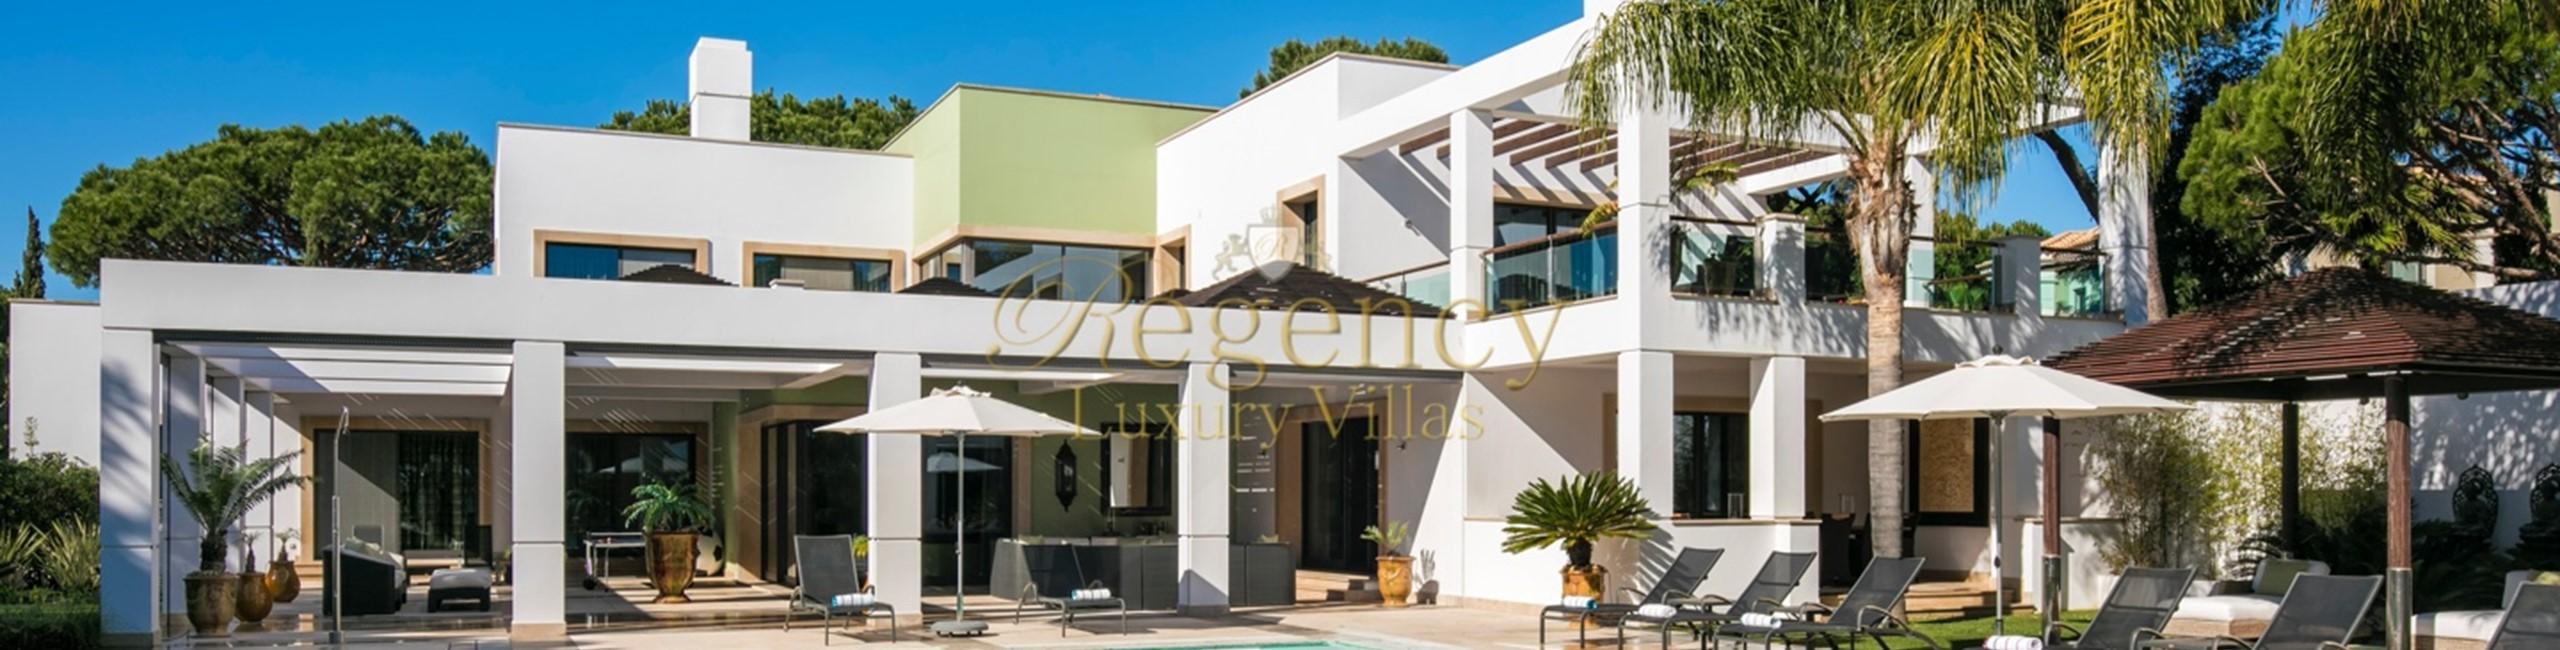 Villa To Rent In Quinta Do Lago 6 Bedroom Villa Rental Regency Luxury Villas